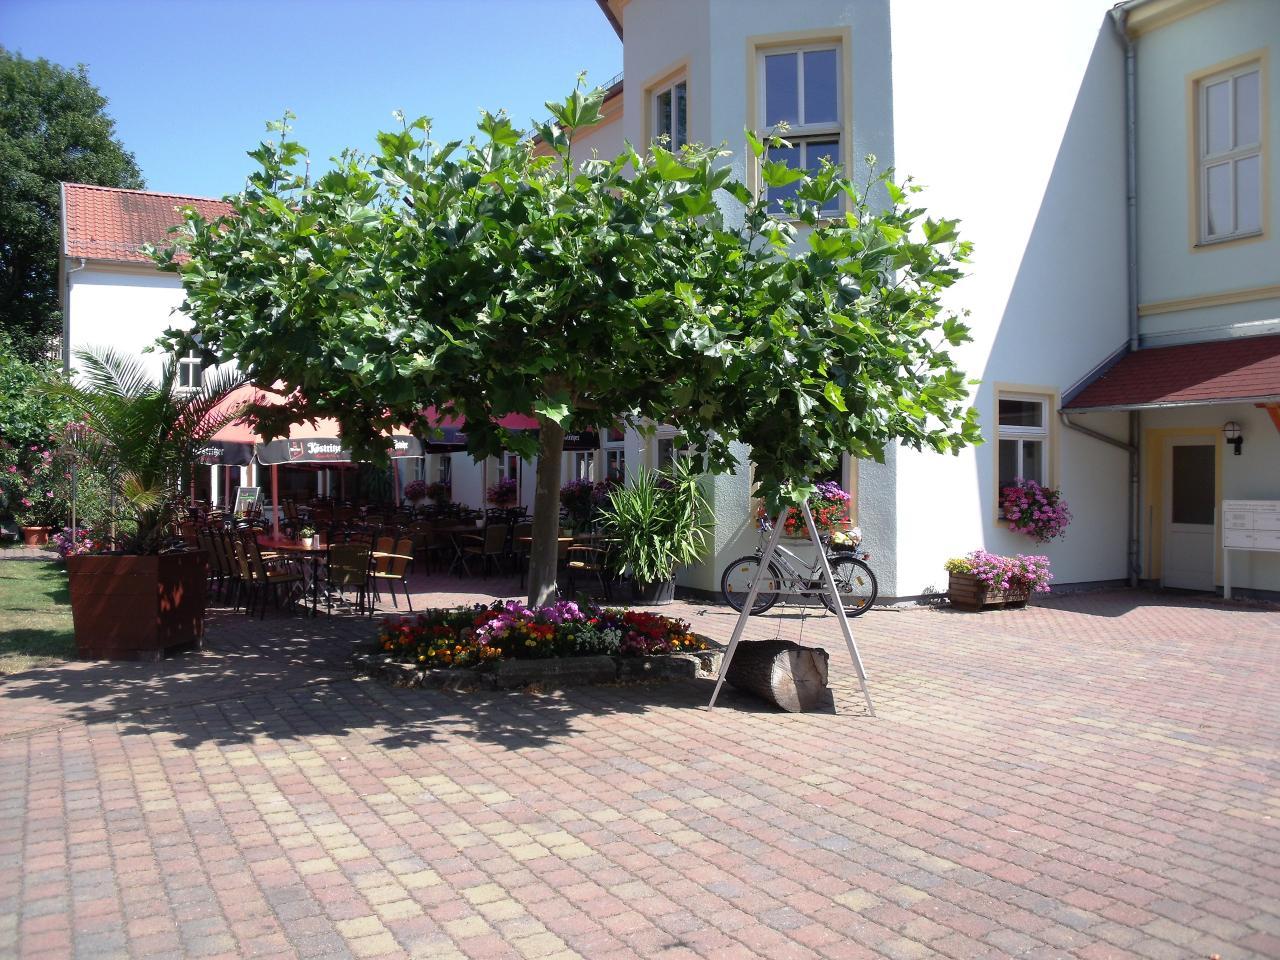 Biergarten v. Puschkinhaus (Cindy Michael TI Mühlhausen).jpg